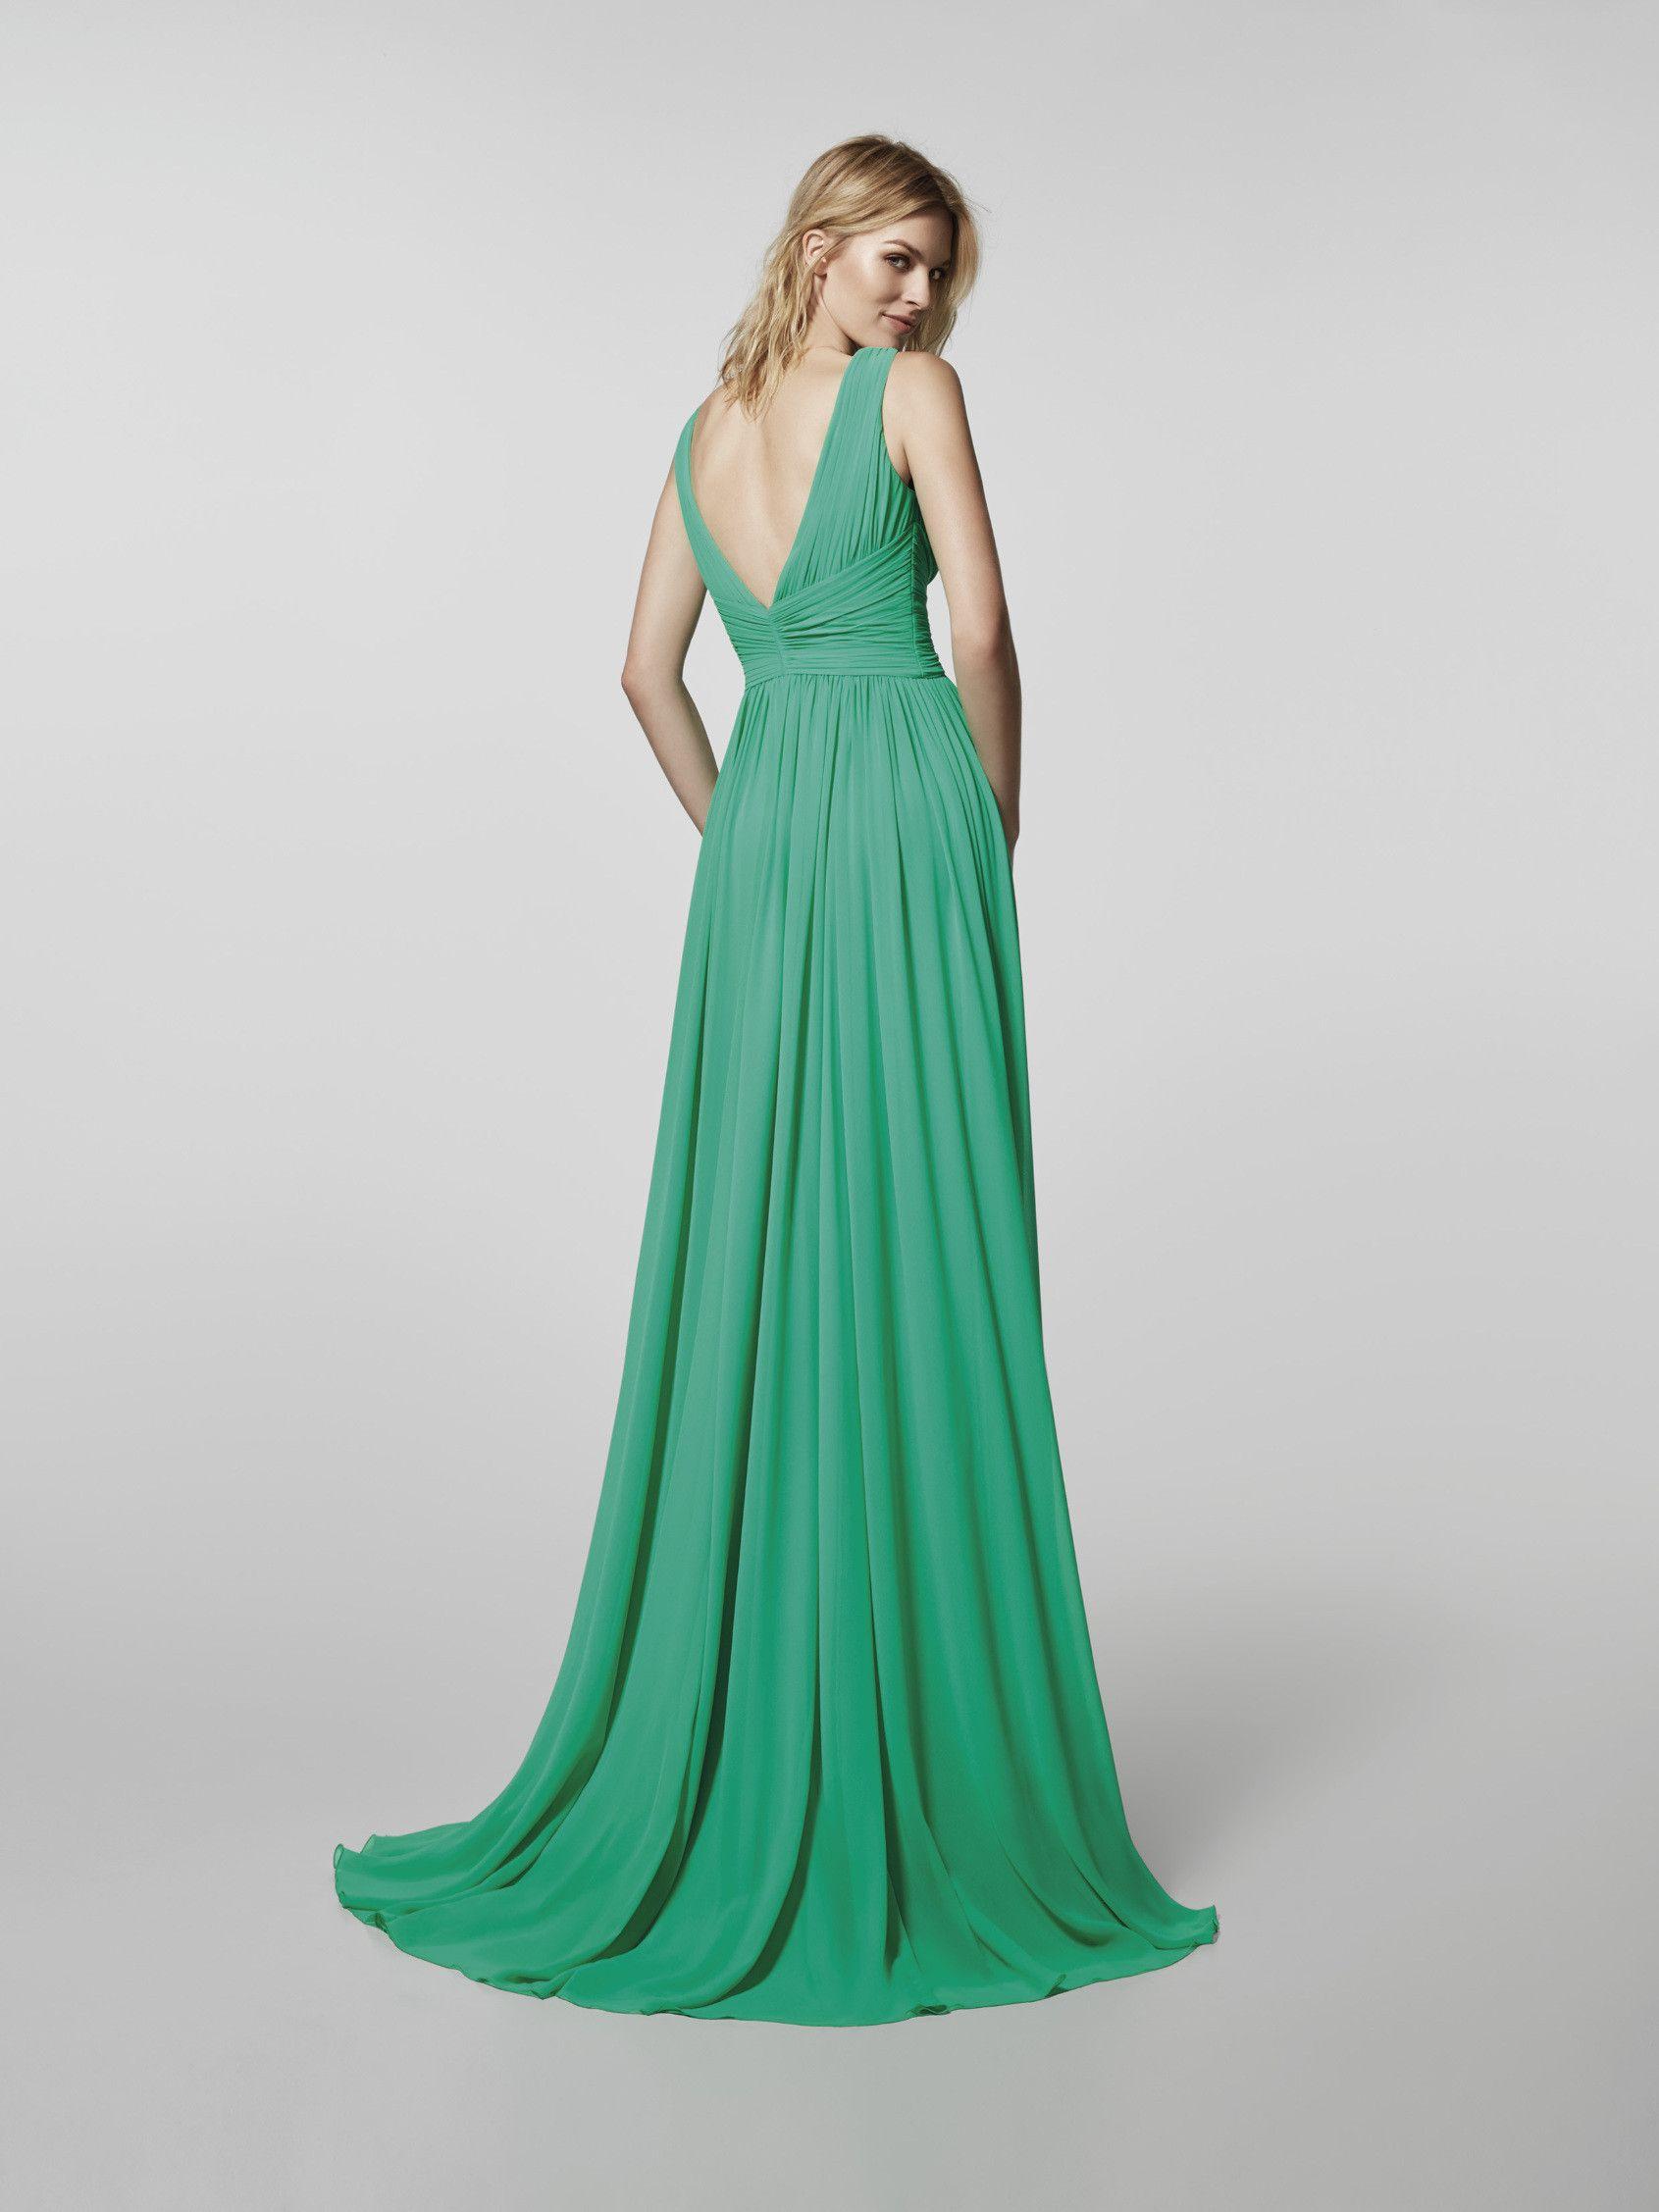 Imagen del vestido de fiesta verde (62039). Vestido GRISELDA largo ...